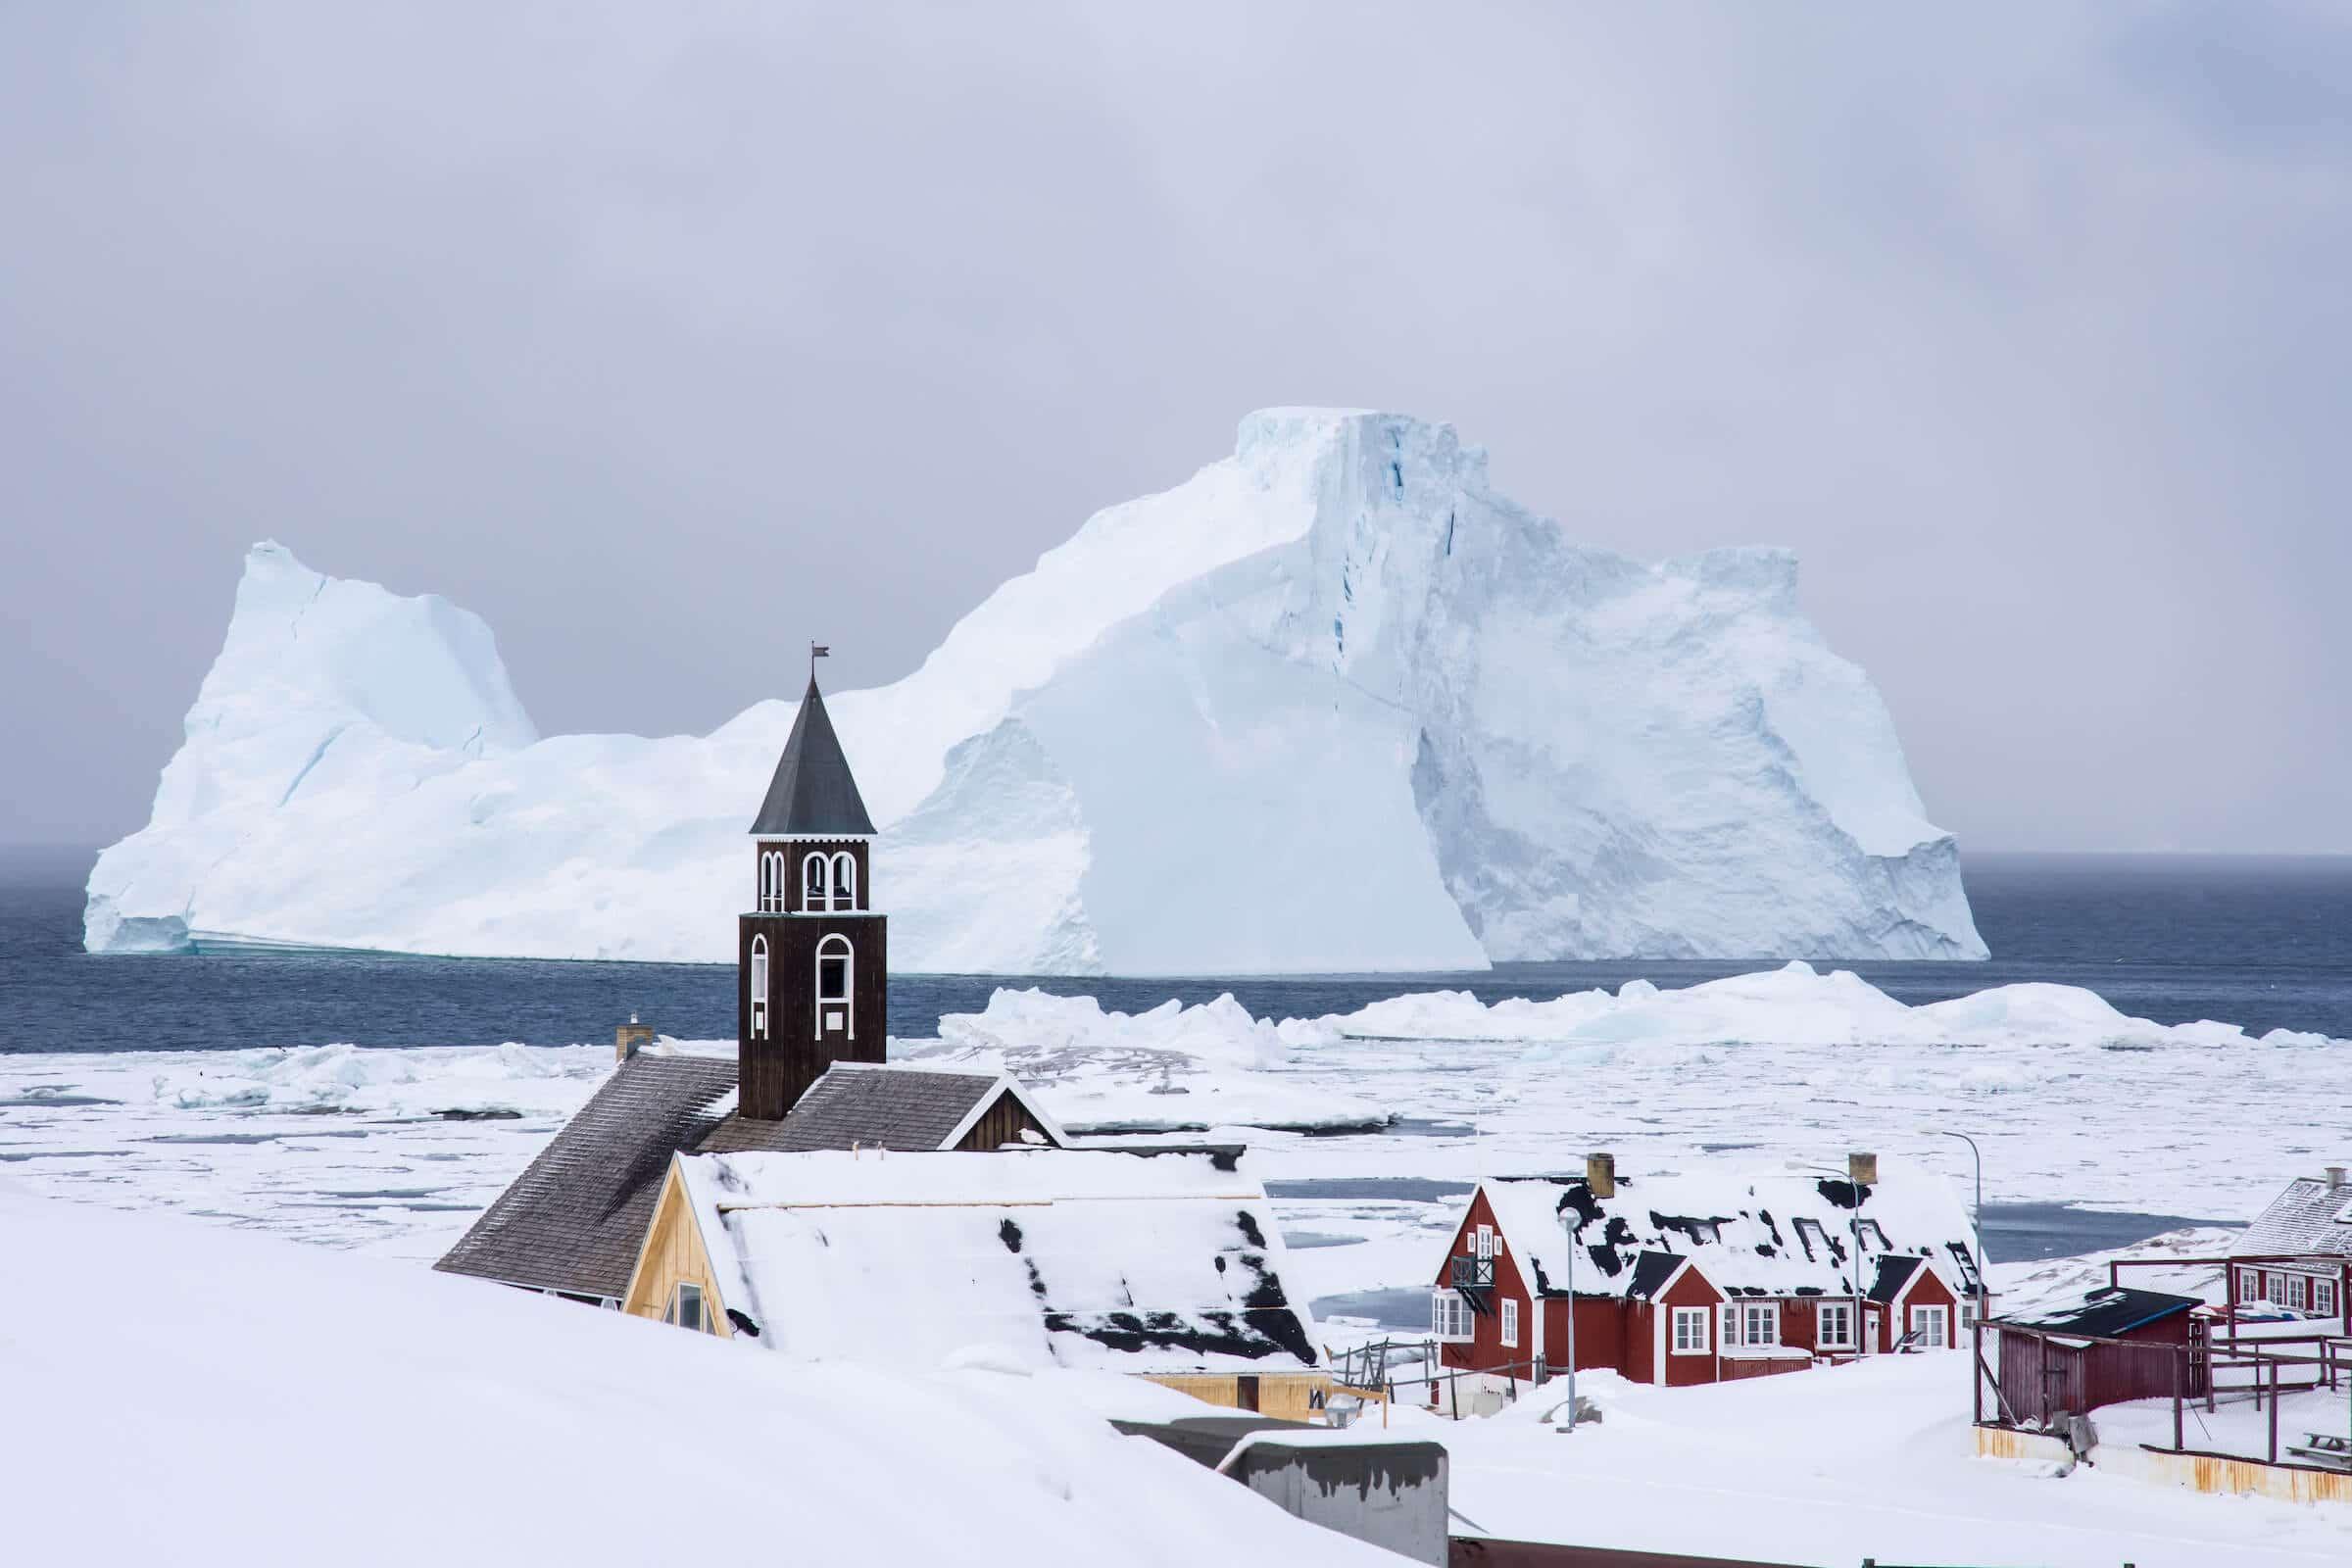 Zions church in Ilulissat. Photo by Inesa Matuliauskaite_Guide to Greenland10